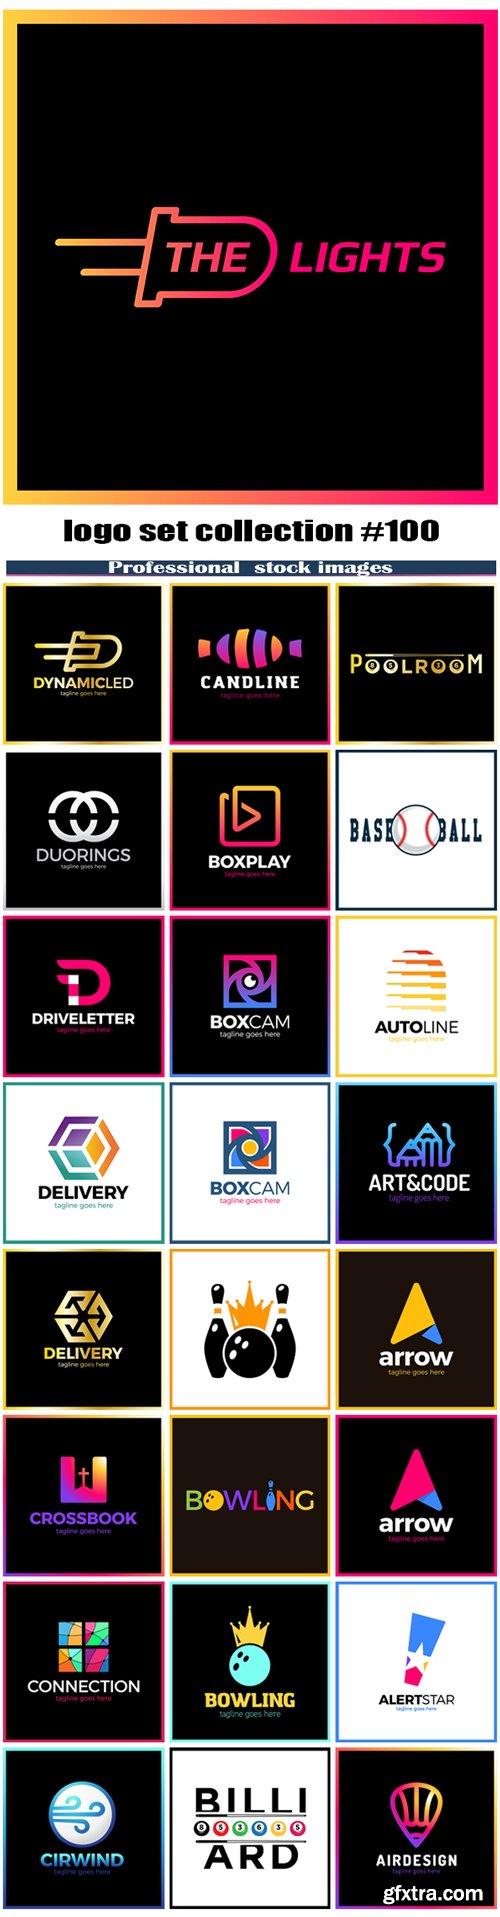 logo set collection #100